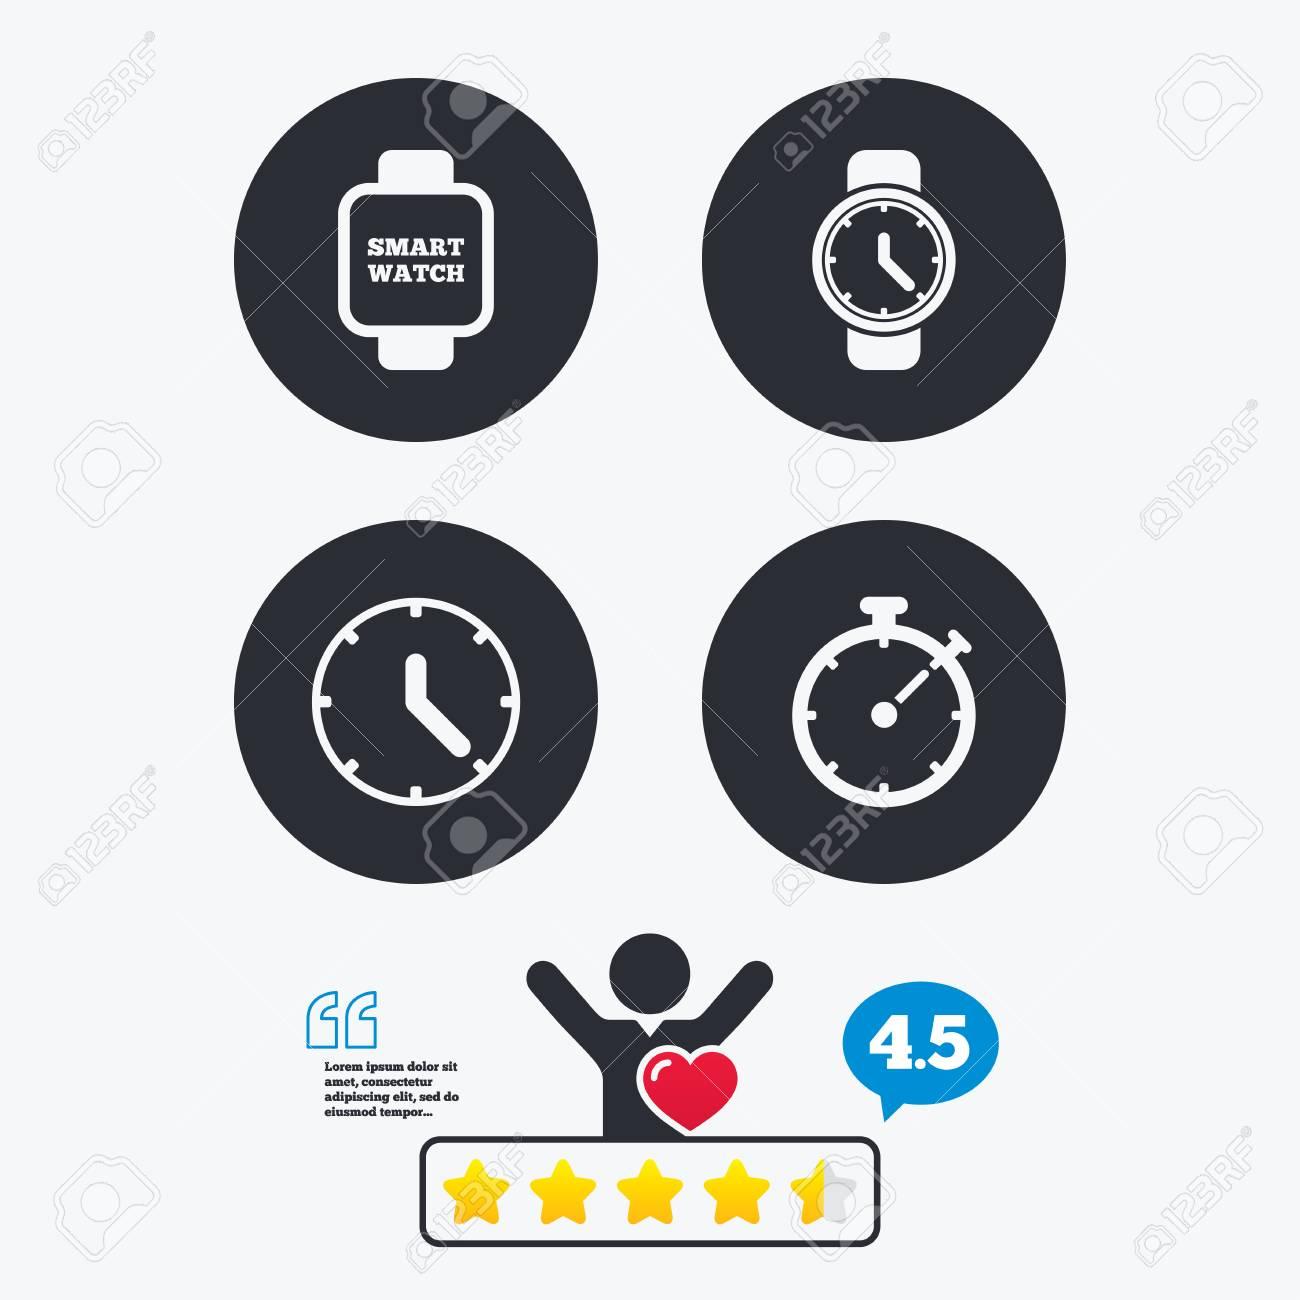 Mechanical symbol art mind map ideas digital symbols dolgularcom 49249047 smart watch icons mechanical clock time stopwatch timer symbols wrist digital watch sign star vote r digital symbols biocorpaavc